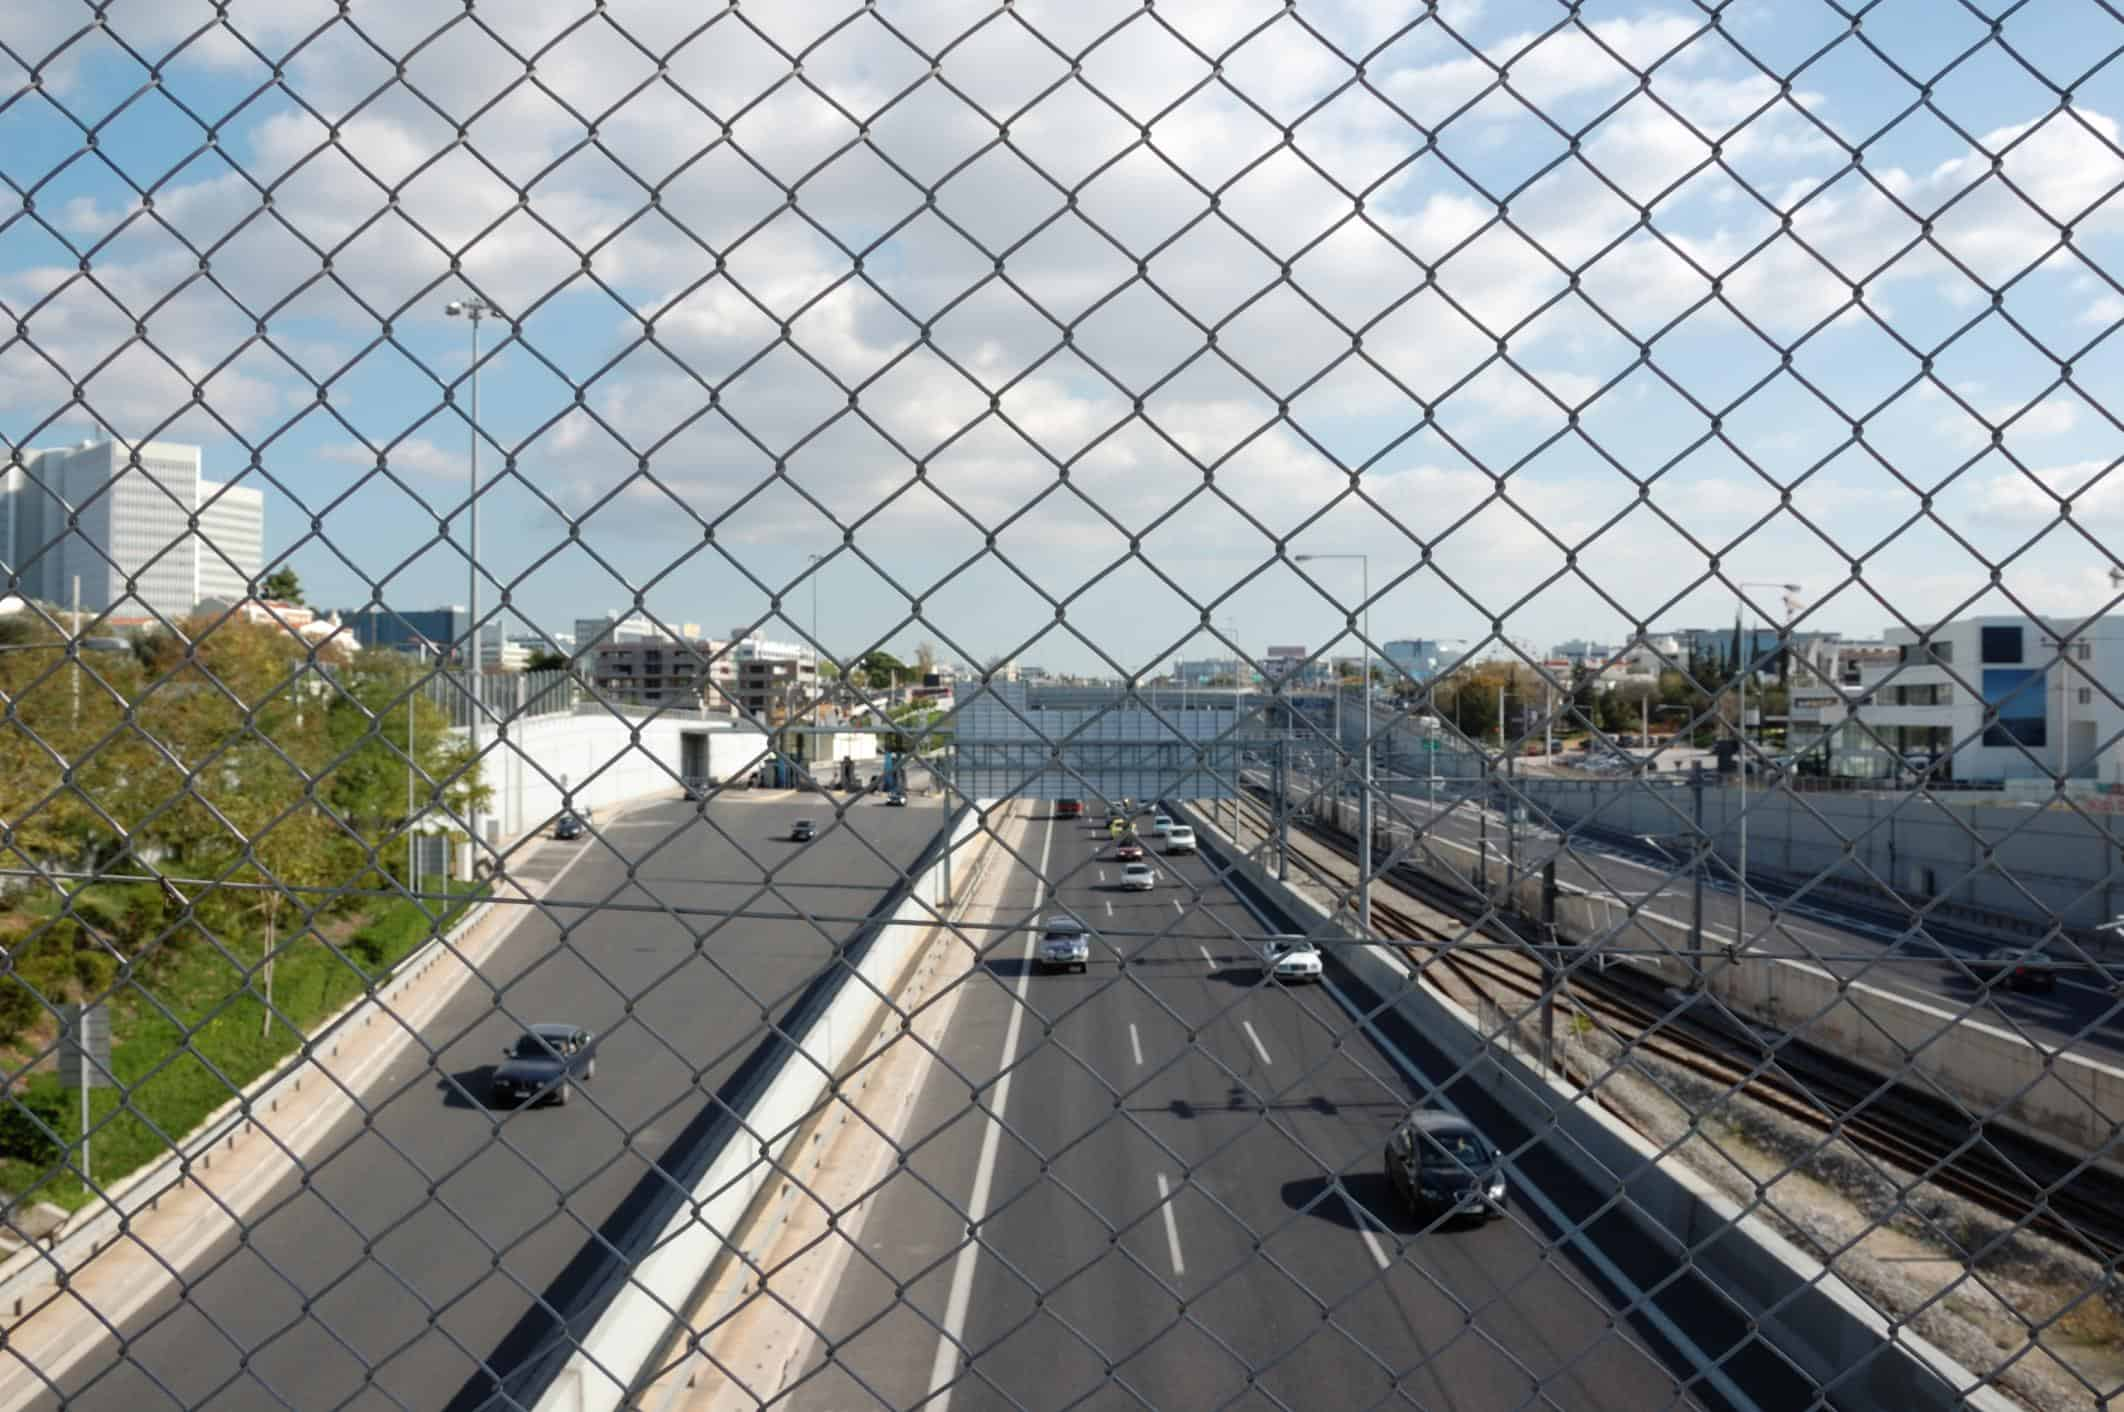 San Bernardino Fences | Chain Link Fencing